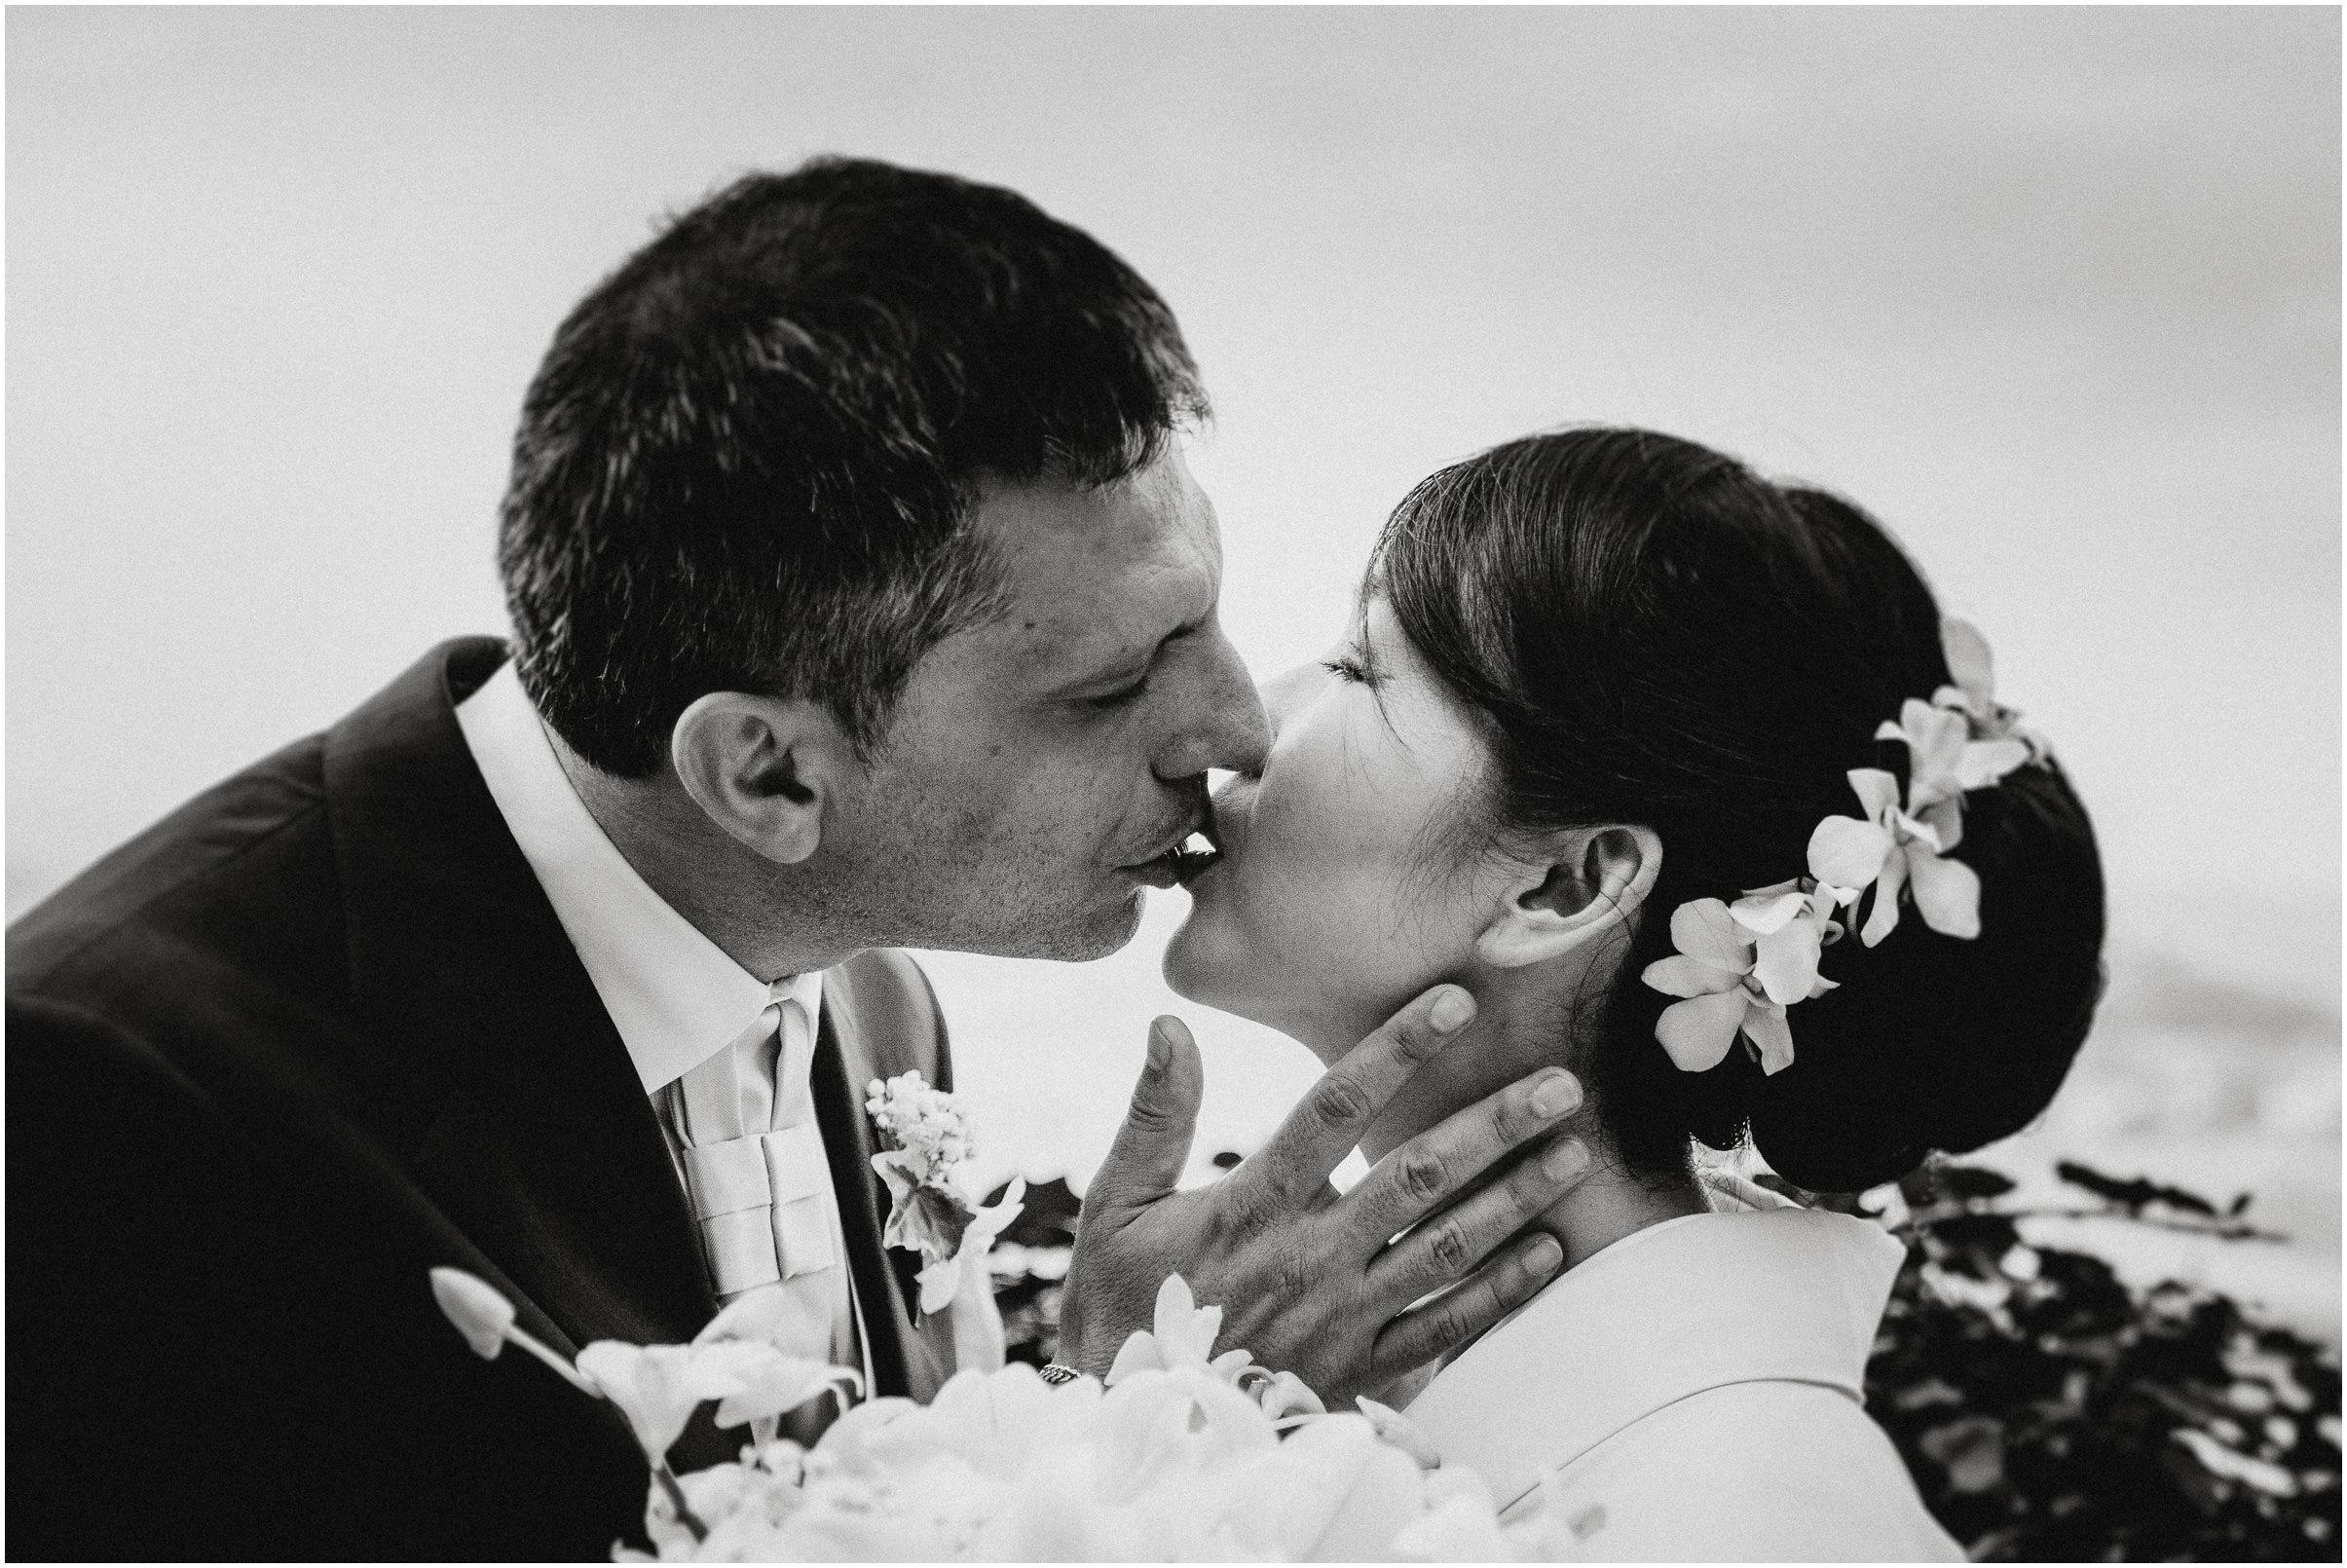 WEDDING-PHOTOGRAPHY-SARA-LORENZONI-FOTOGRAFIA-MATRIMONIO-ORVIETO-JUKA-ANTONELLO32